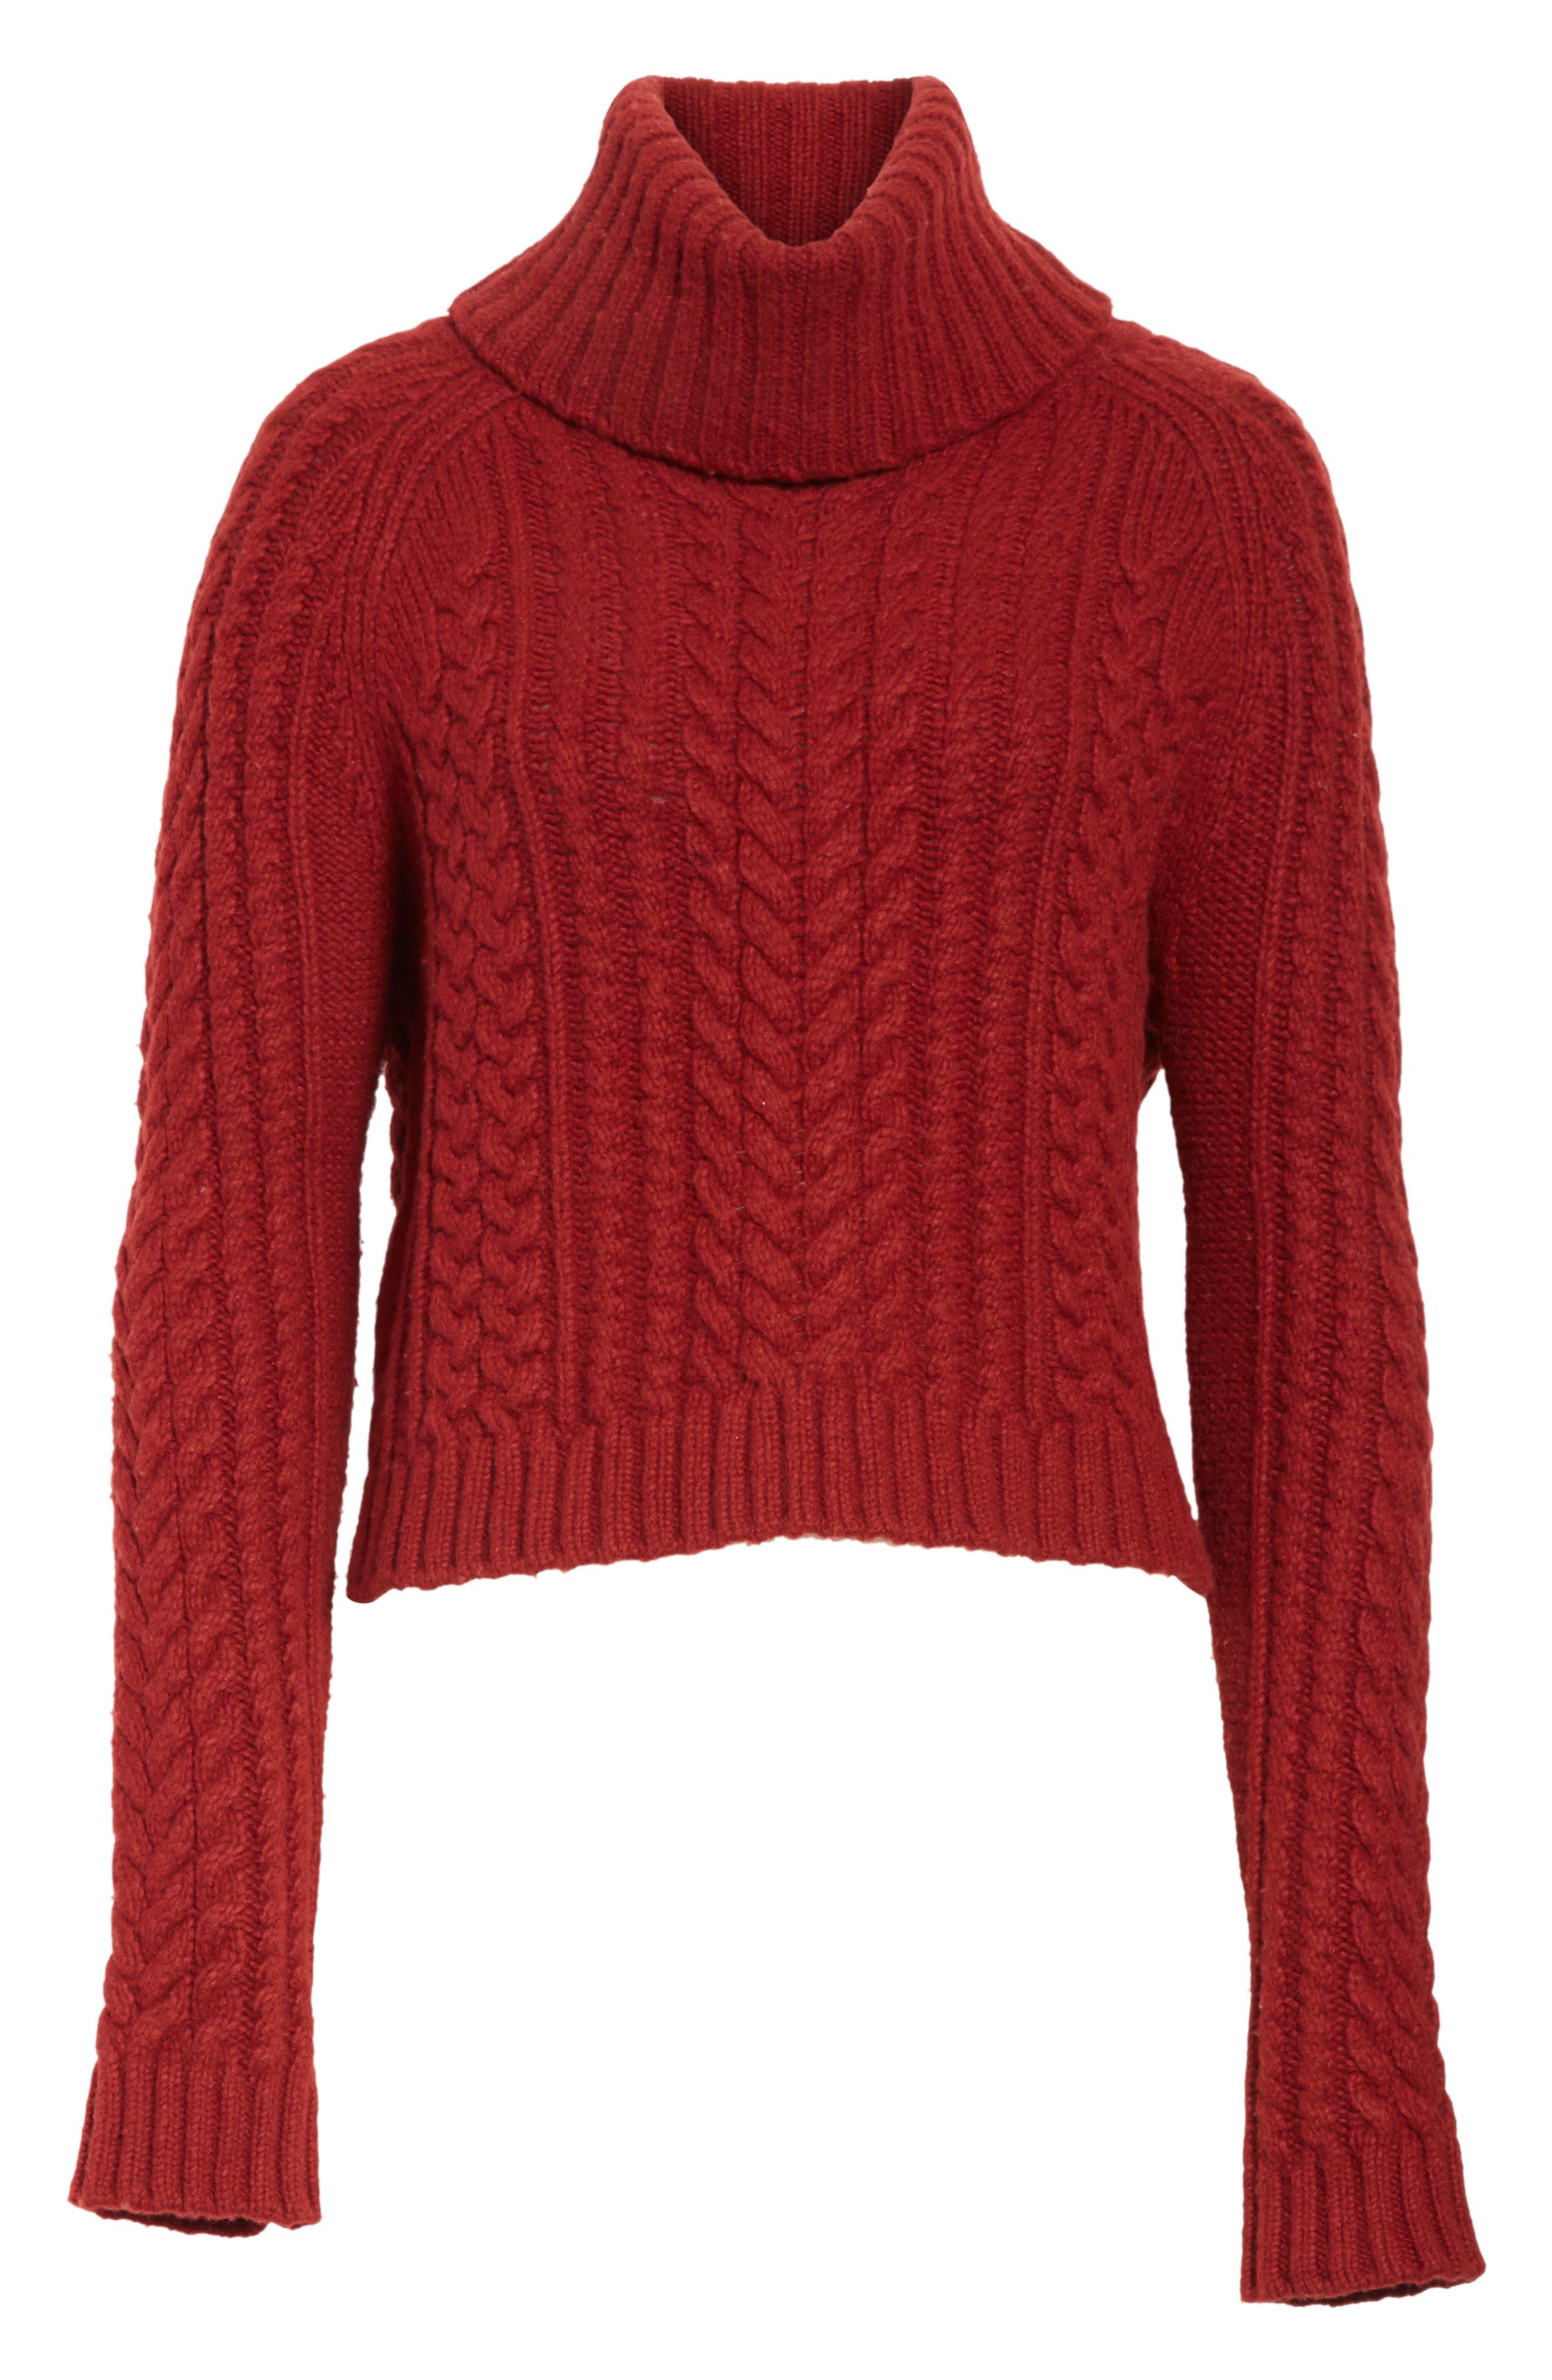 Tobin Cable Knit Crop Turtleneck Sweater,                             Alternate thumbnail 6, color,                             939